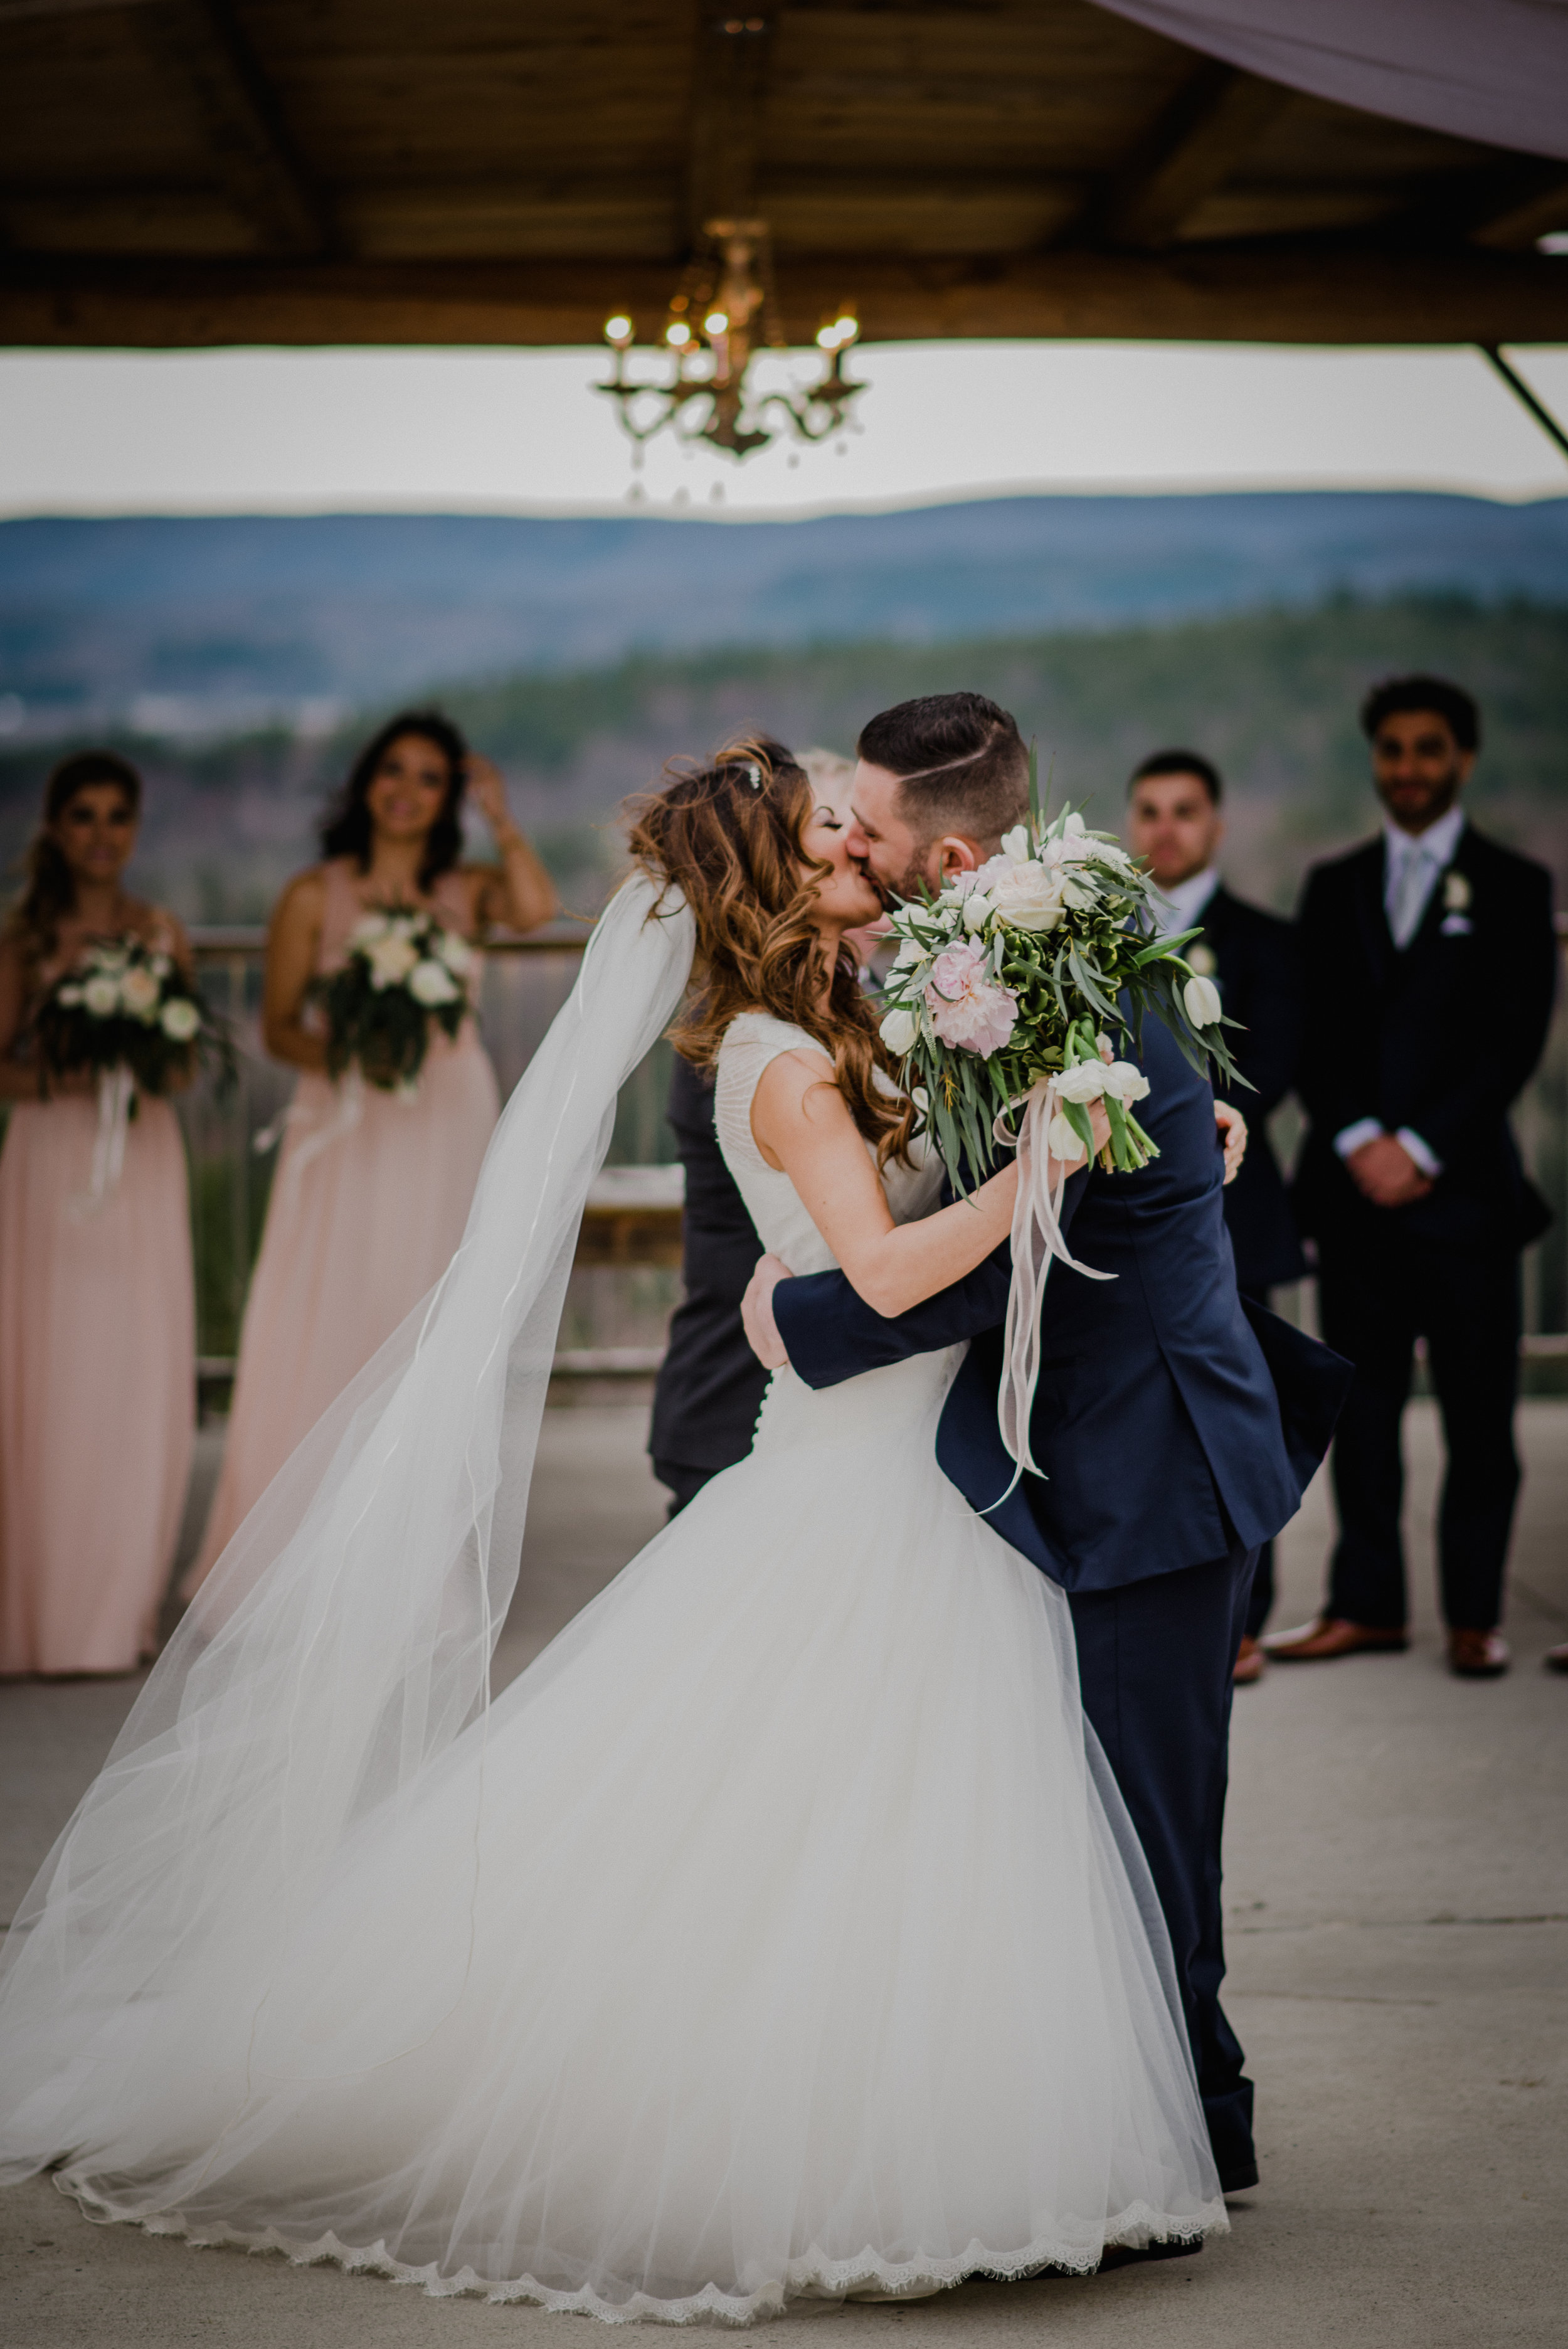 e Belvedere, Wakefield Wedding - Ceremony 7